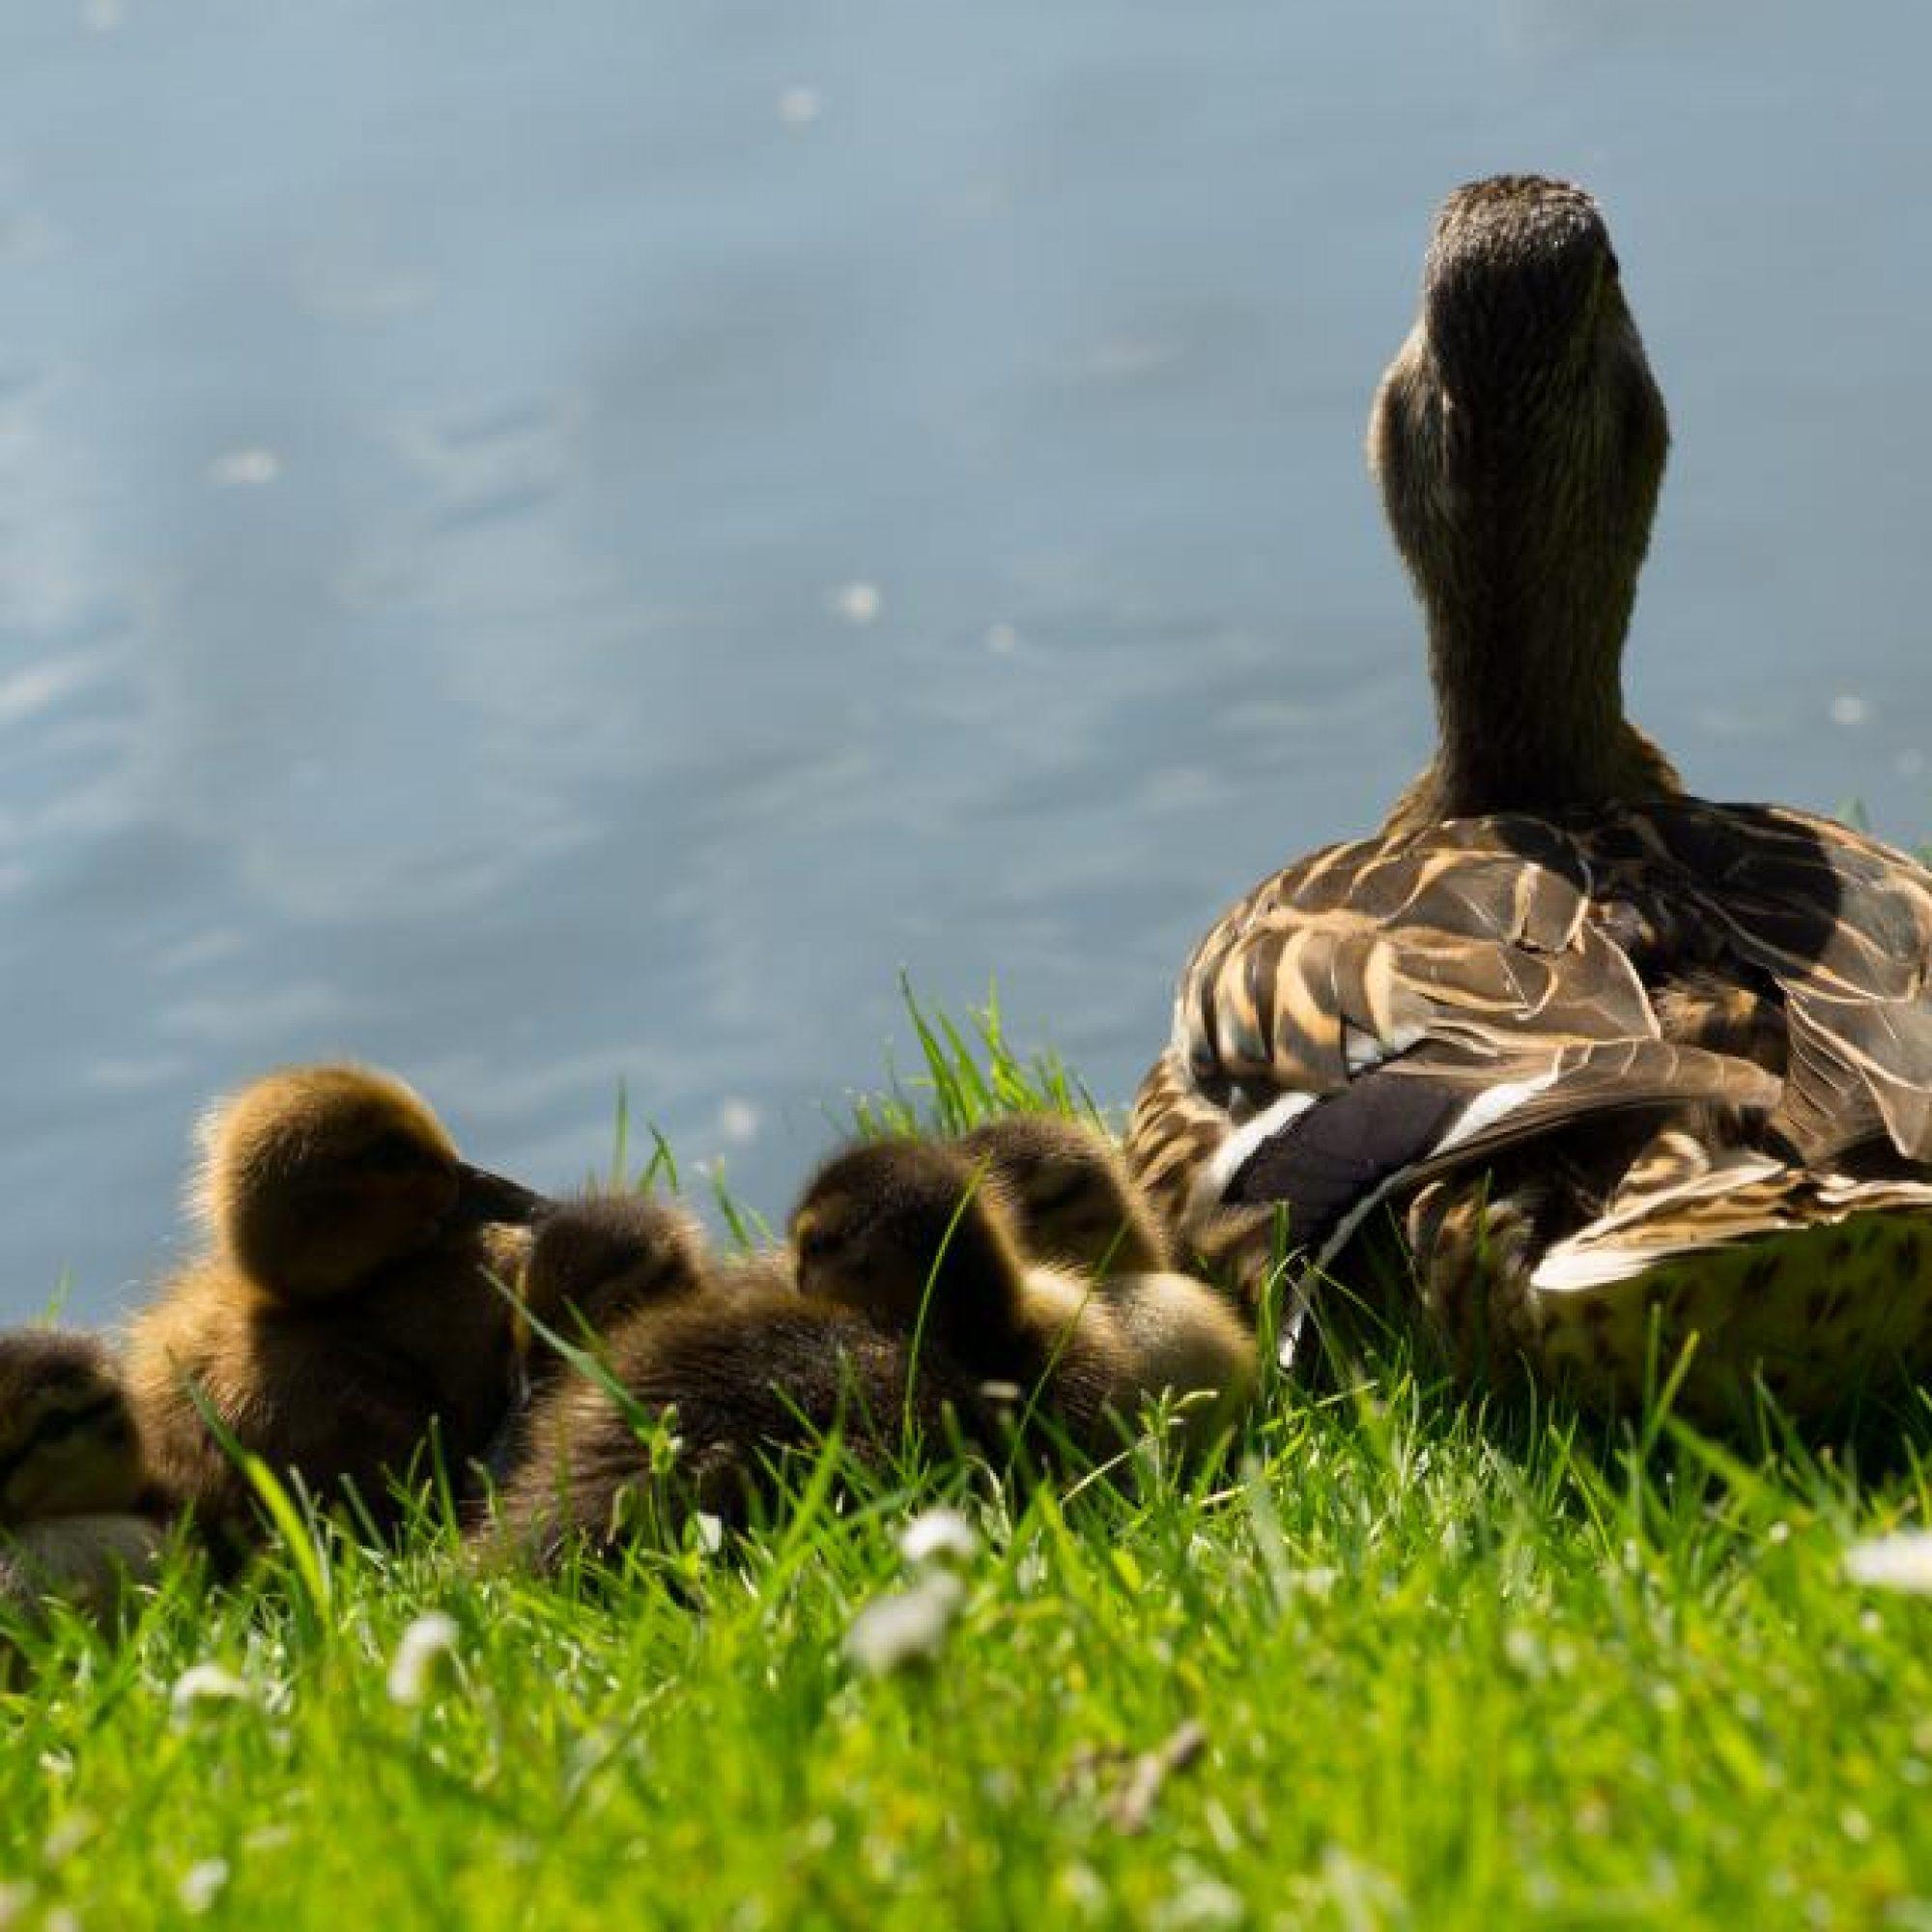 duck3 - Copy